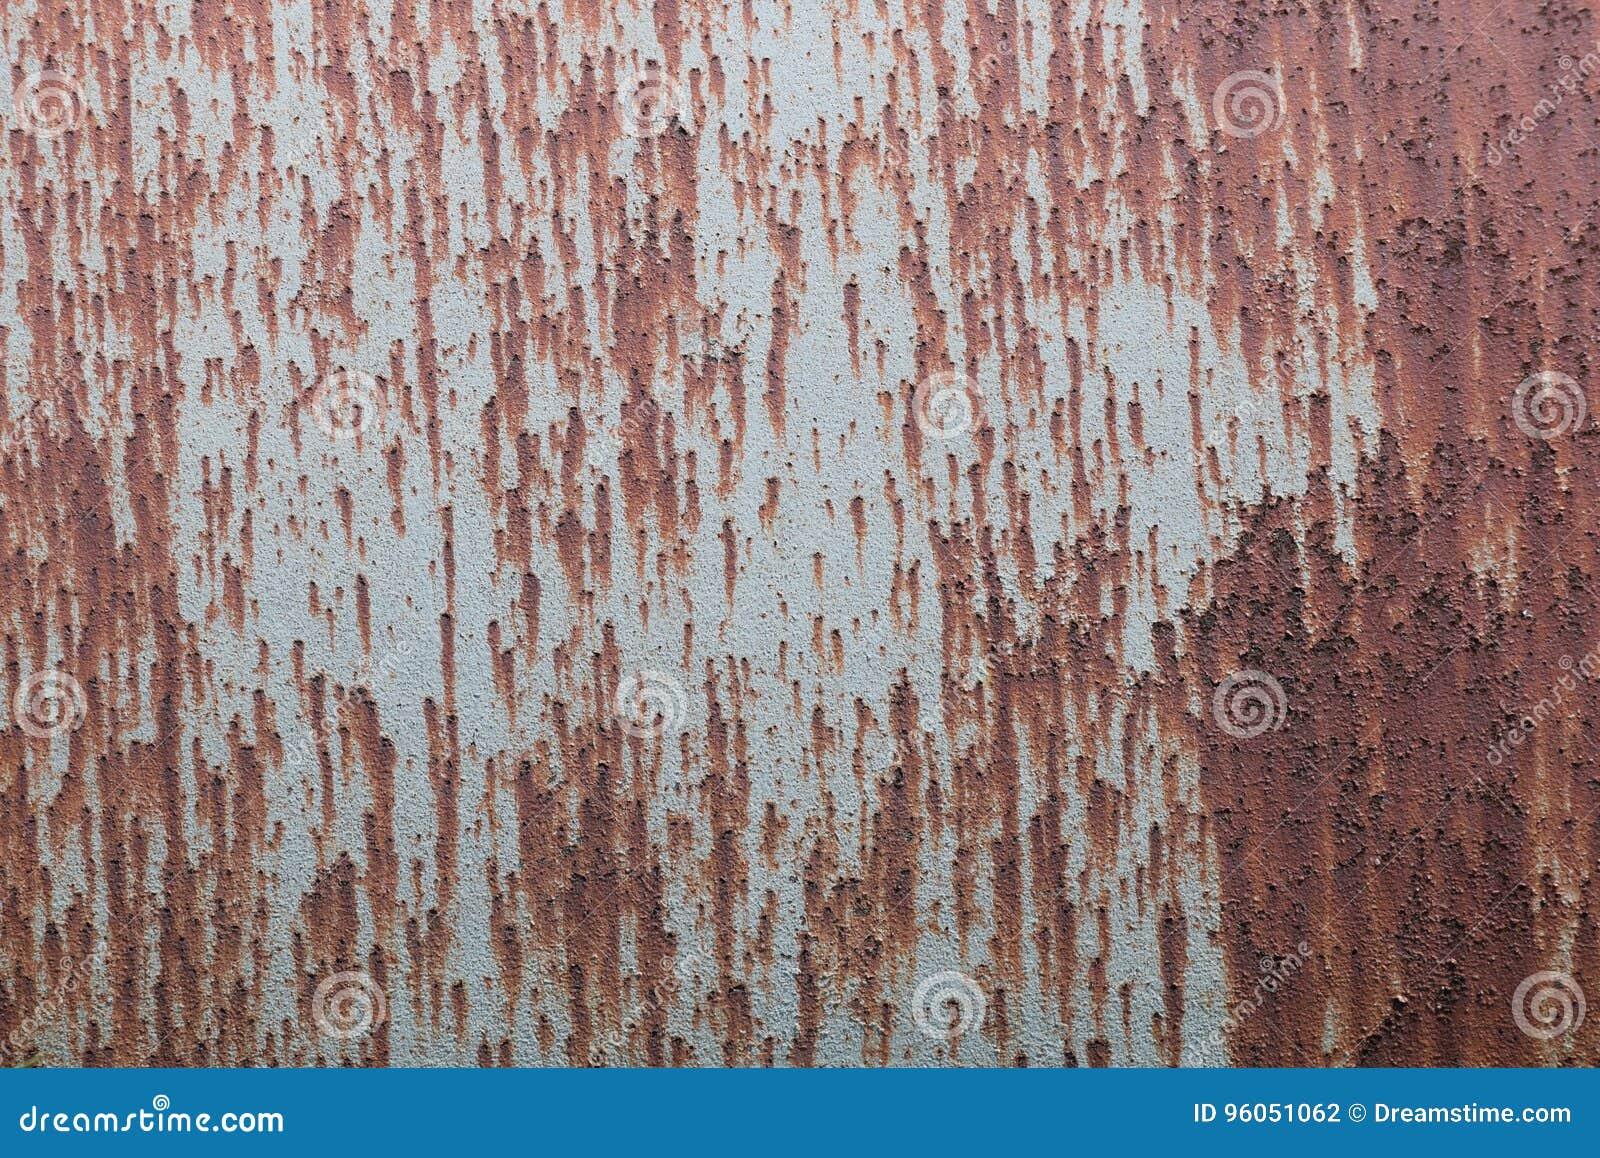 Rusty Metal Backgound